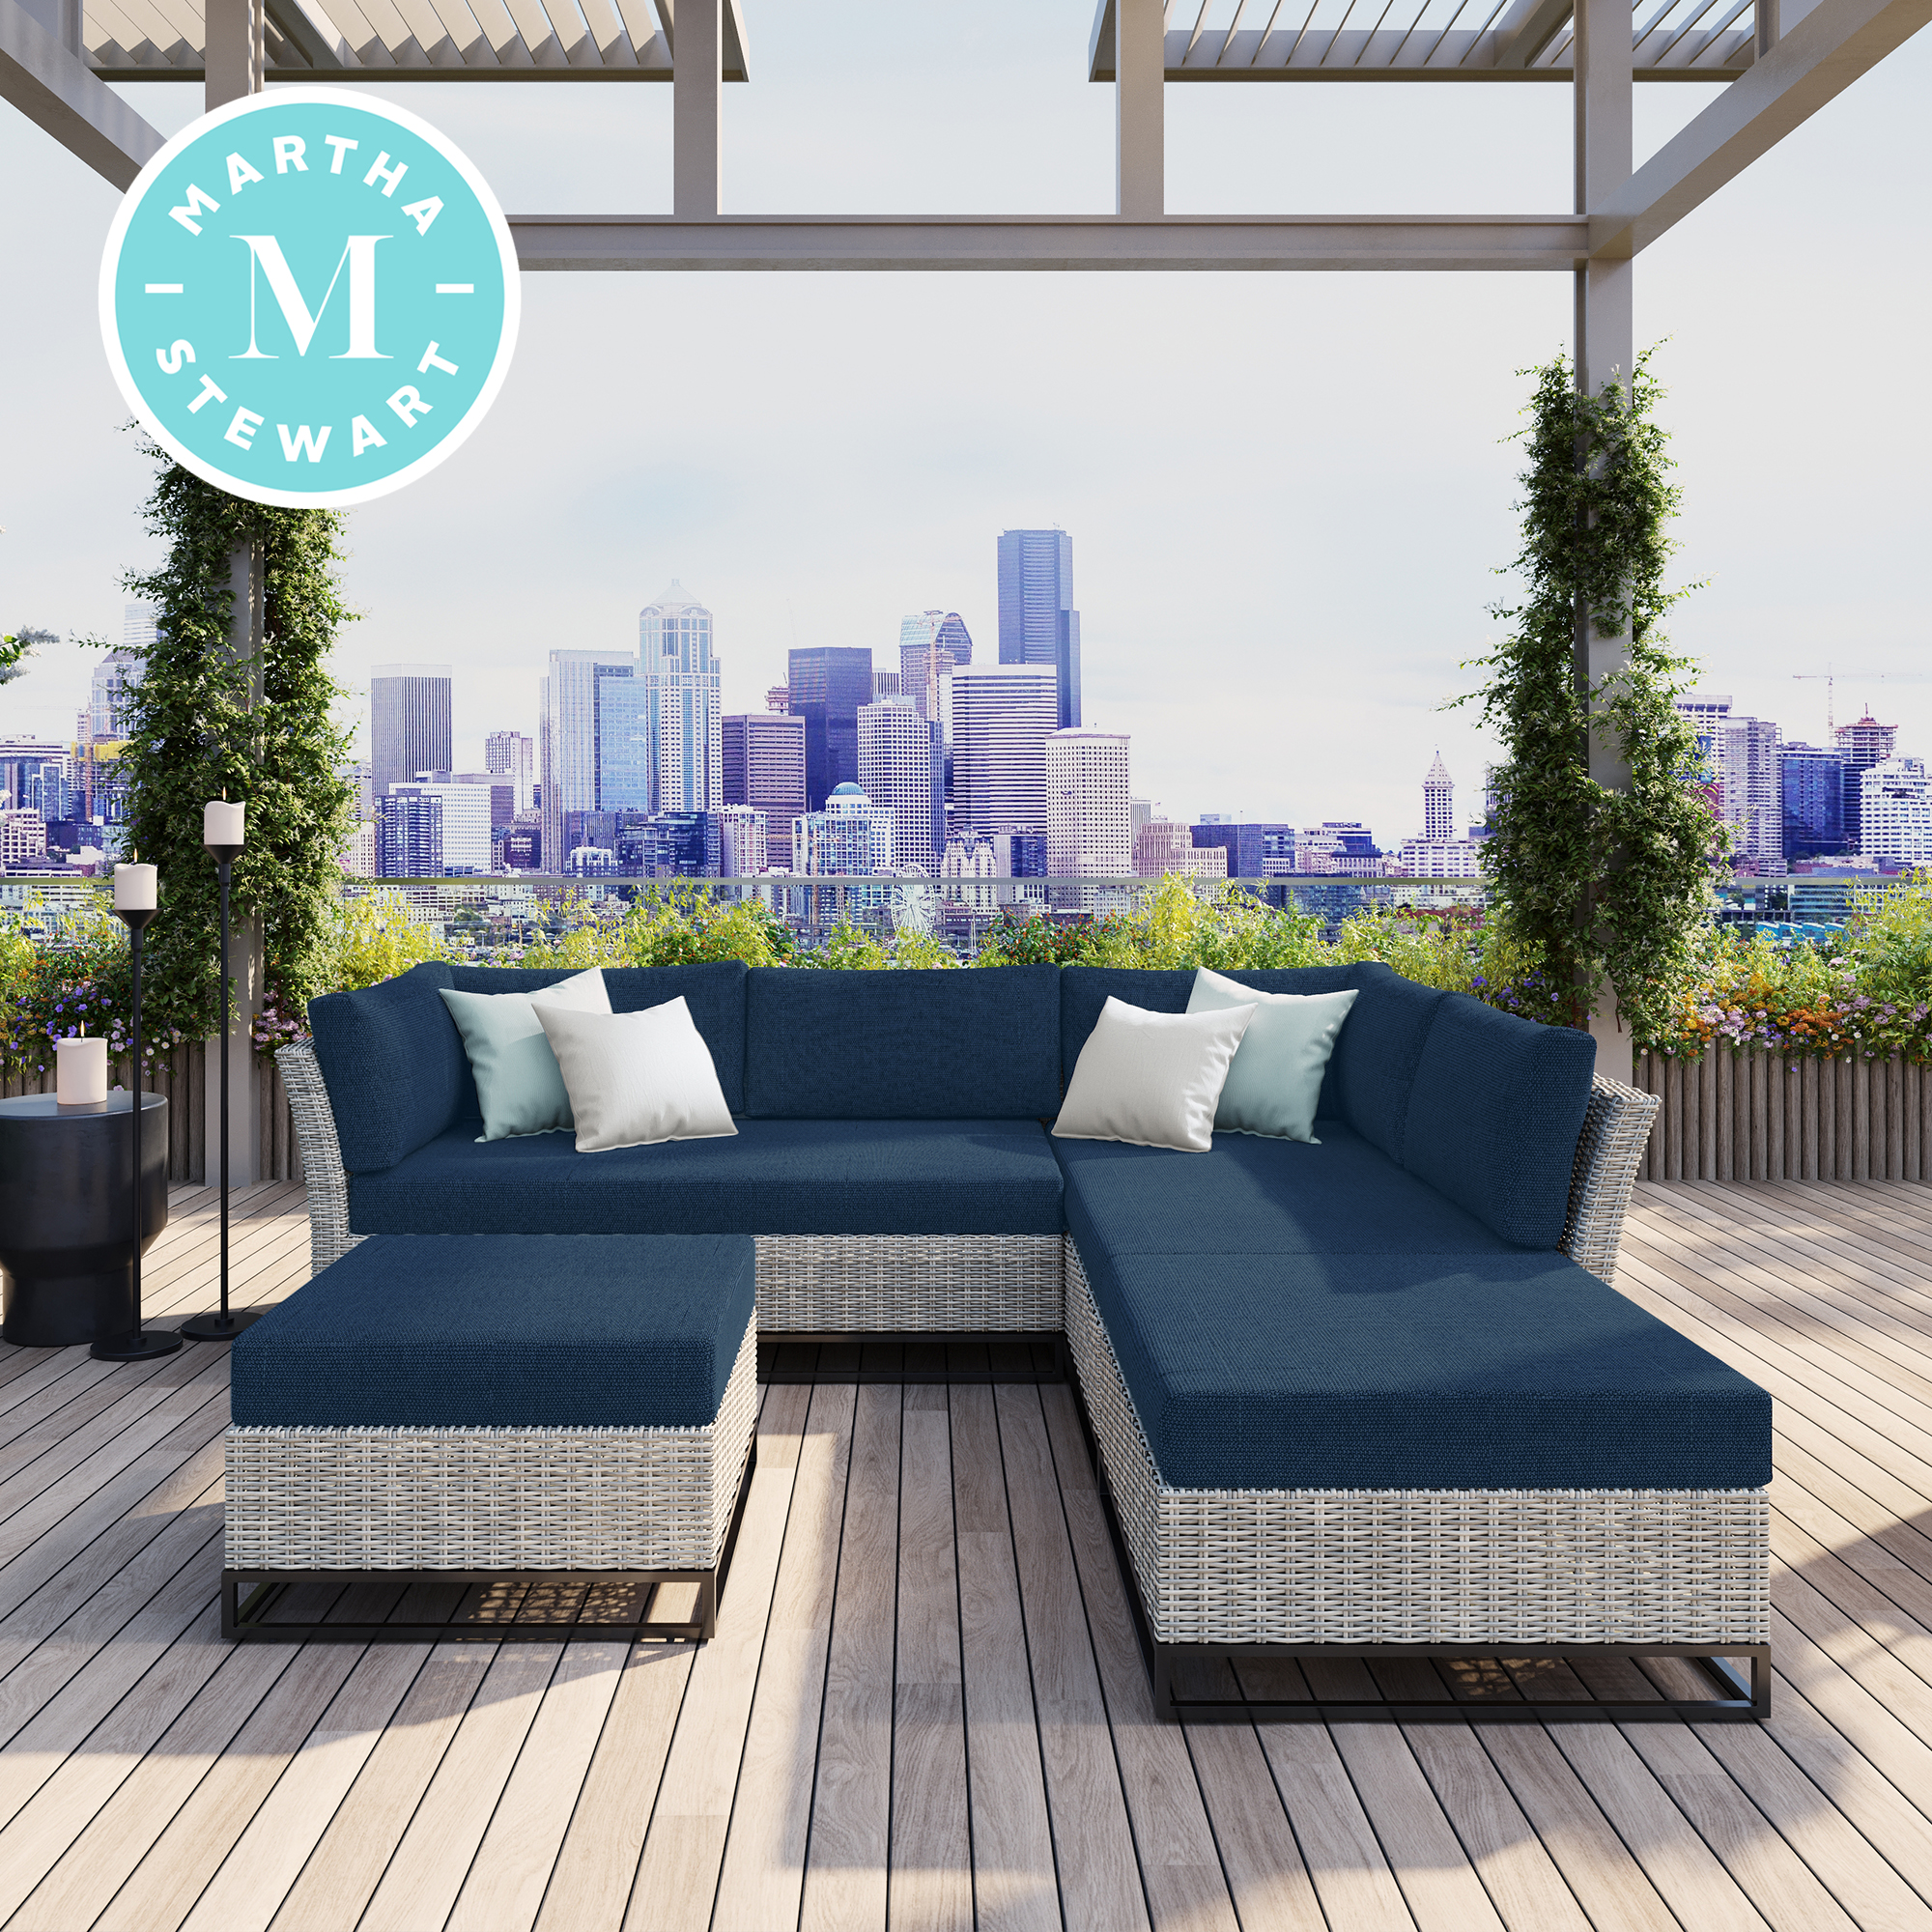 martha stewart martha stewart clarence 4 piece aluminum frame patio conversation set with navy blue olefin cushions from walmart accuweather